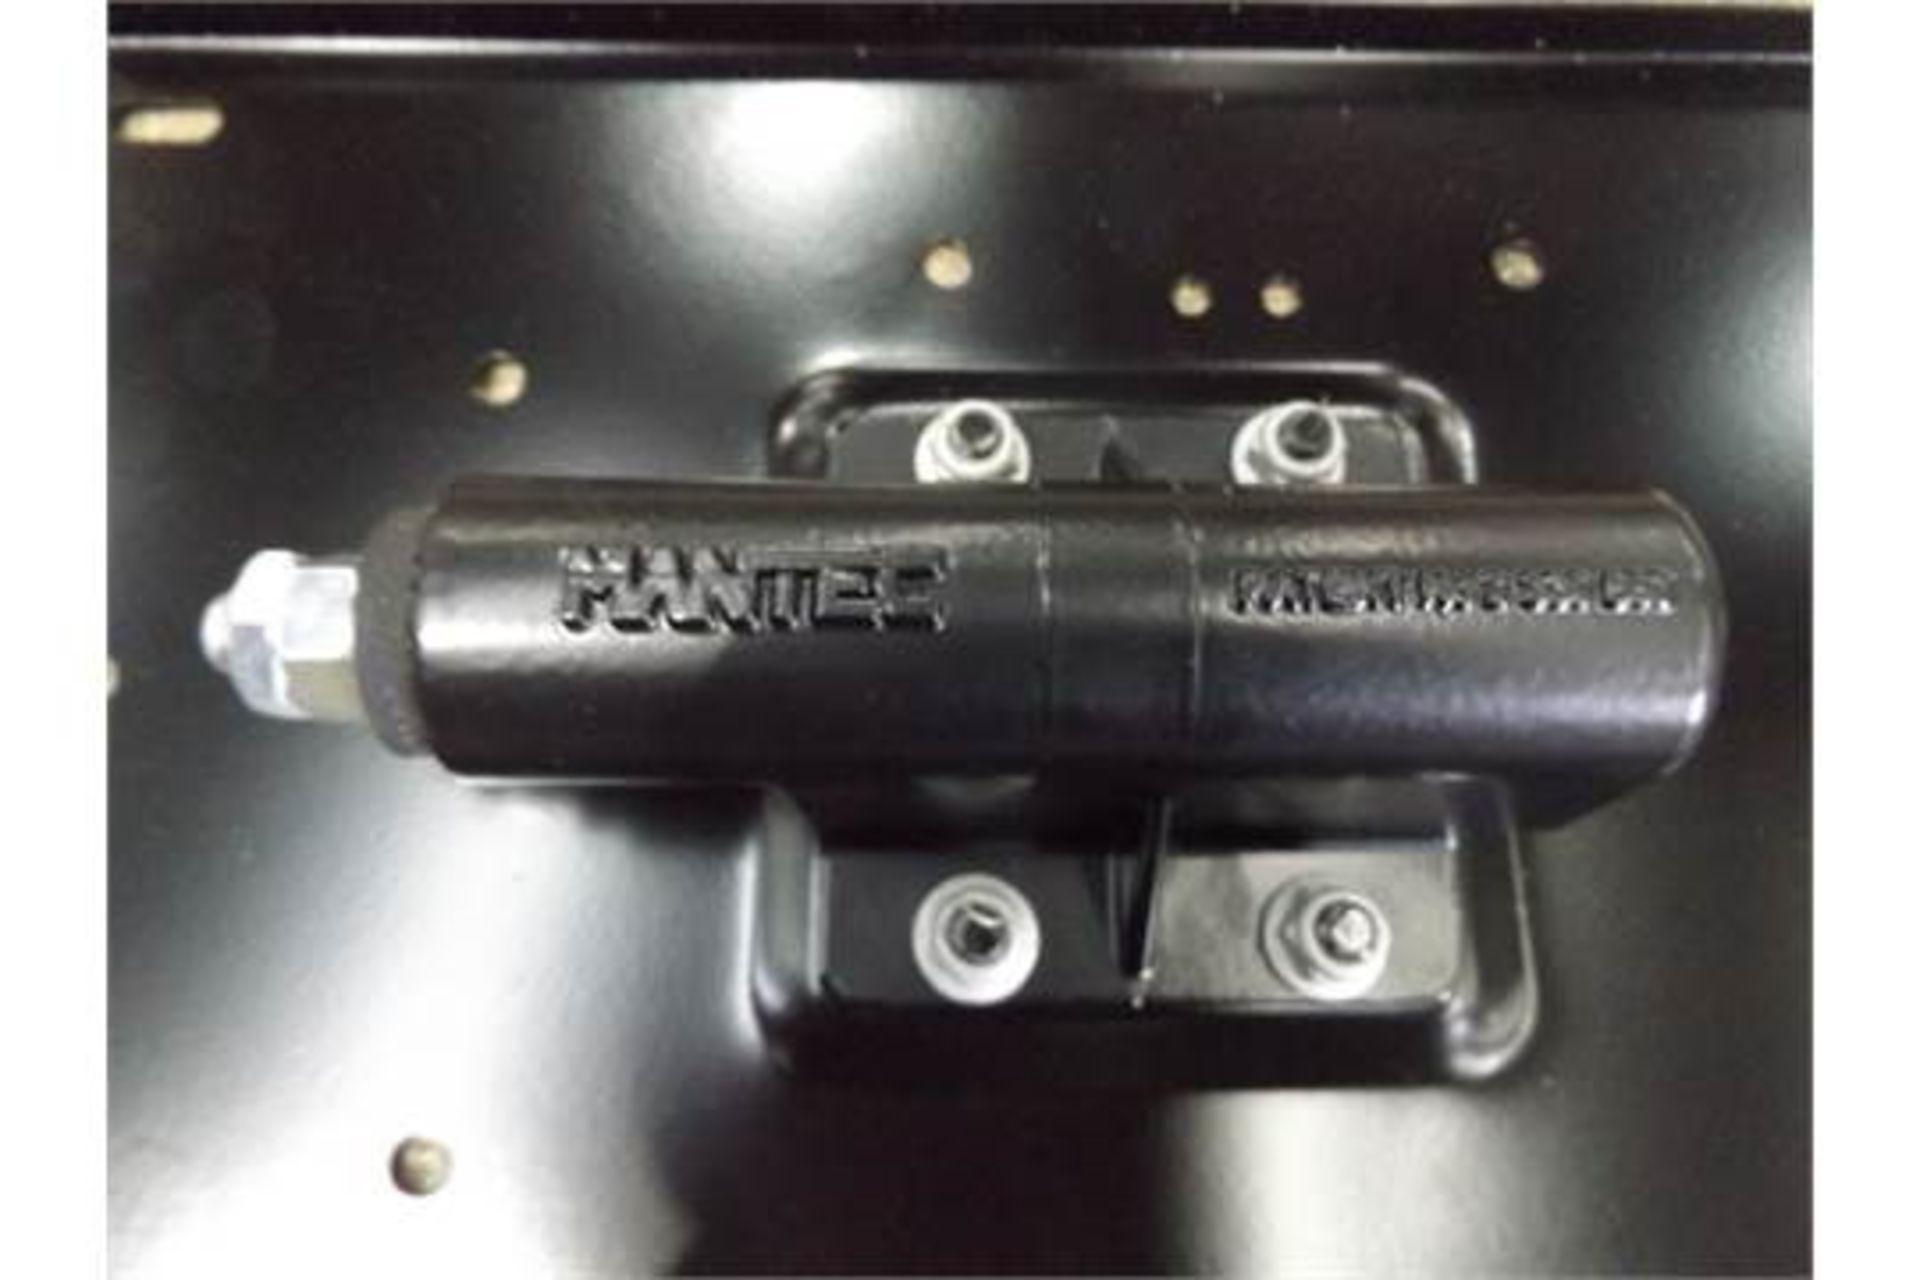 Lot 27246 - Land Rover Swing Out Spare Wheel Carrier Kit VPLDR0130